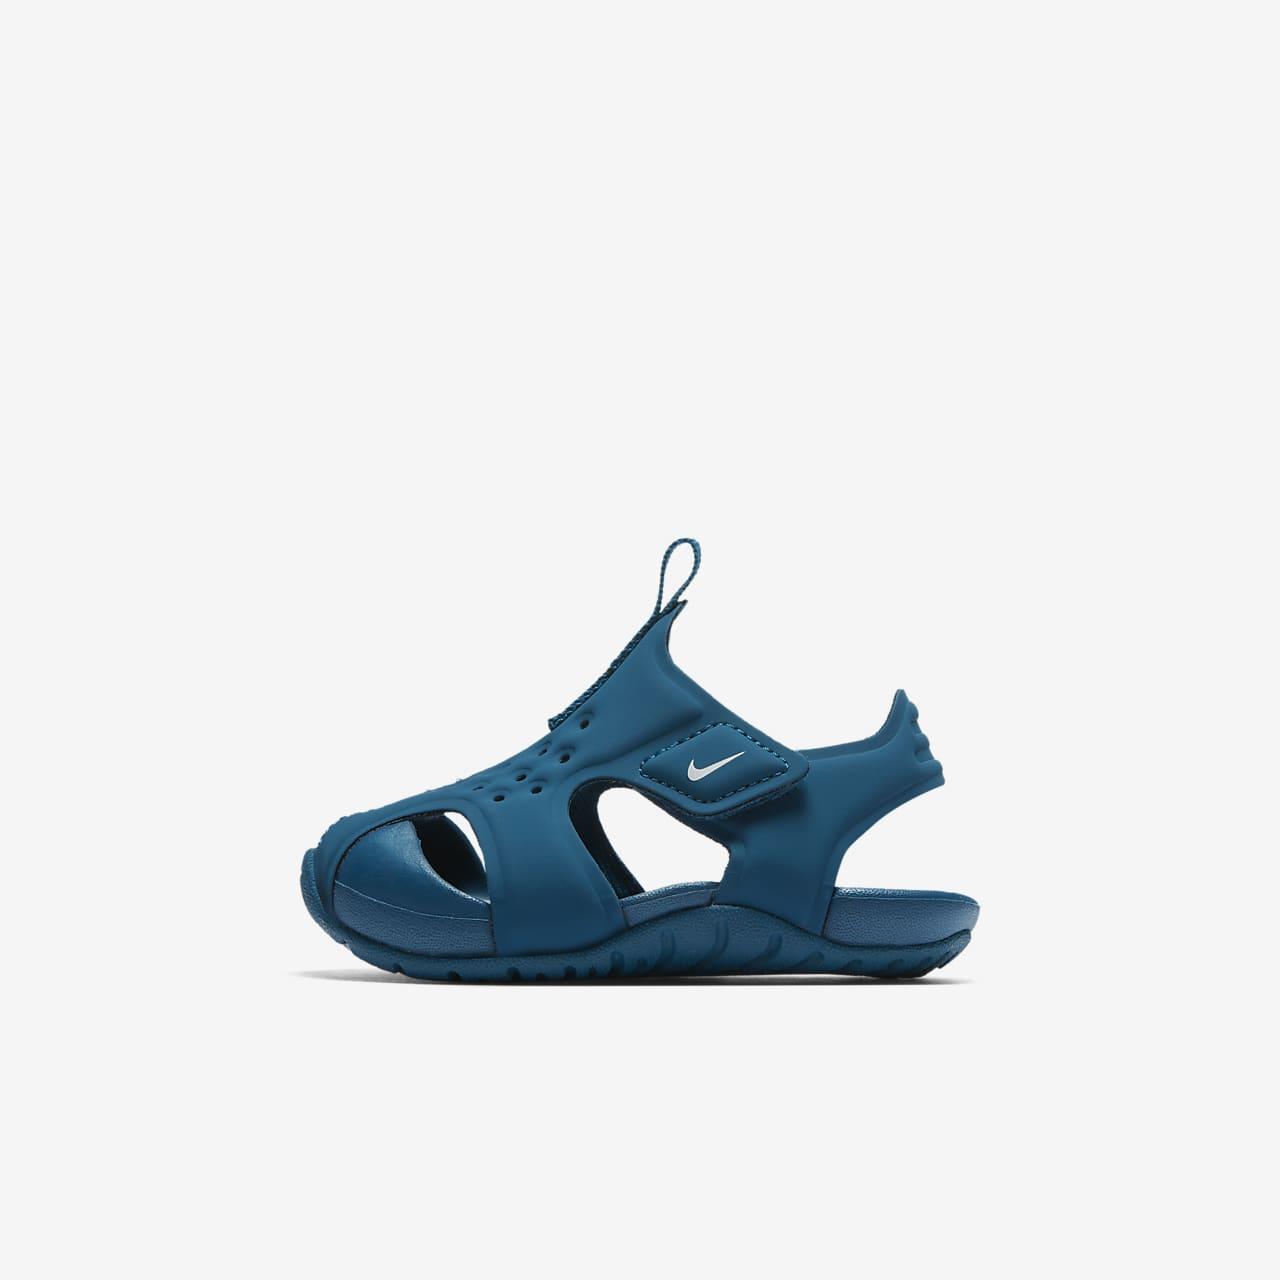 Nike Sunray Protect 2 Baby and Toddler Sandal